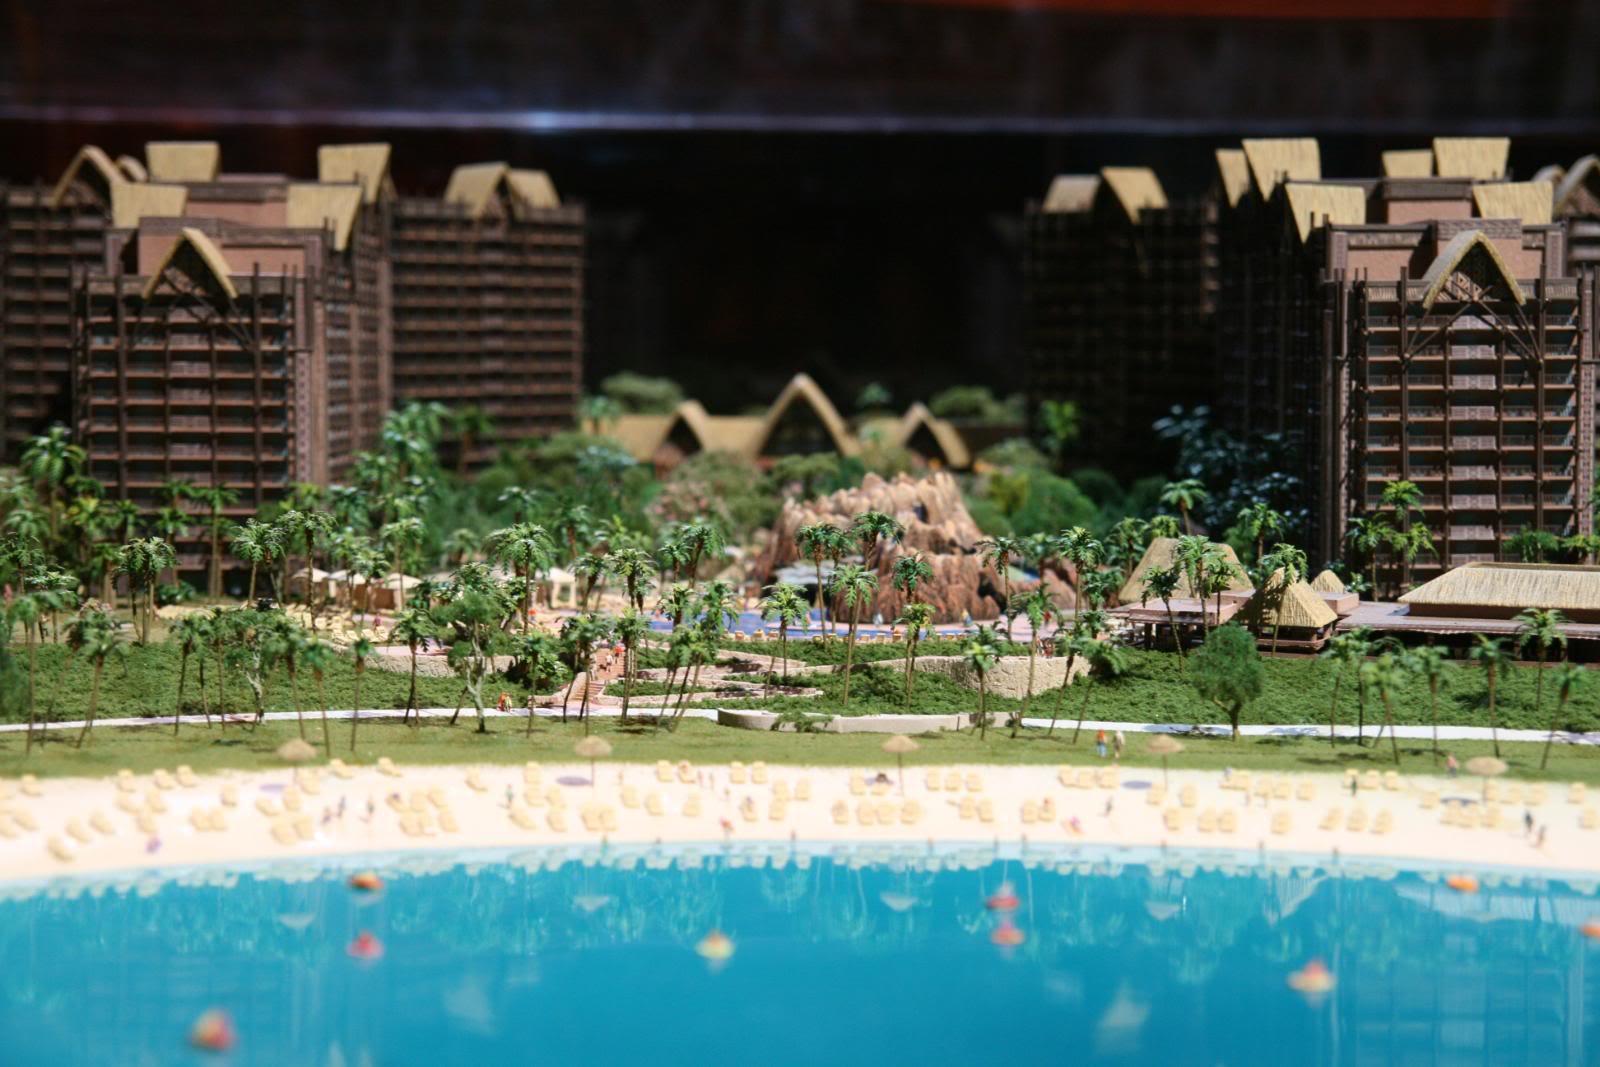 [Disney Vacation Club] Aulani, a Disney Resort & Spa (29 août 2011) - Page 2 IMG_9495